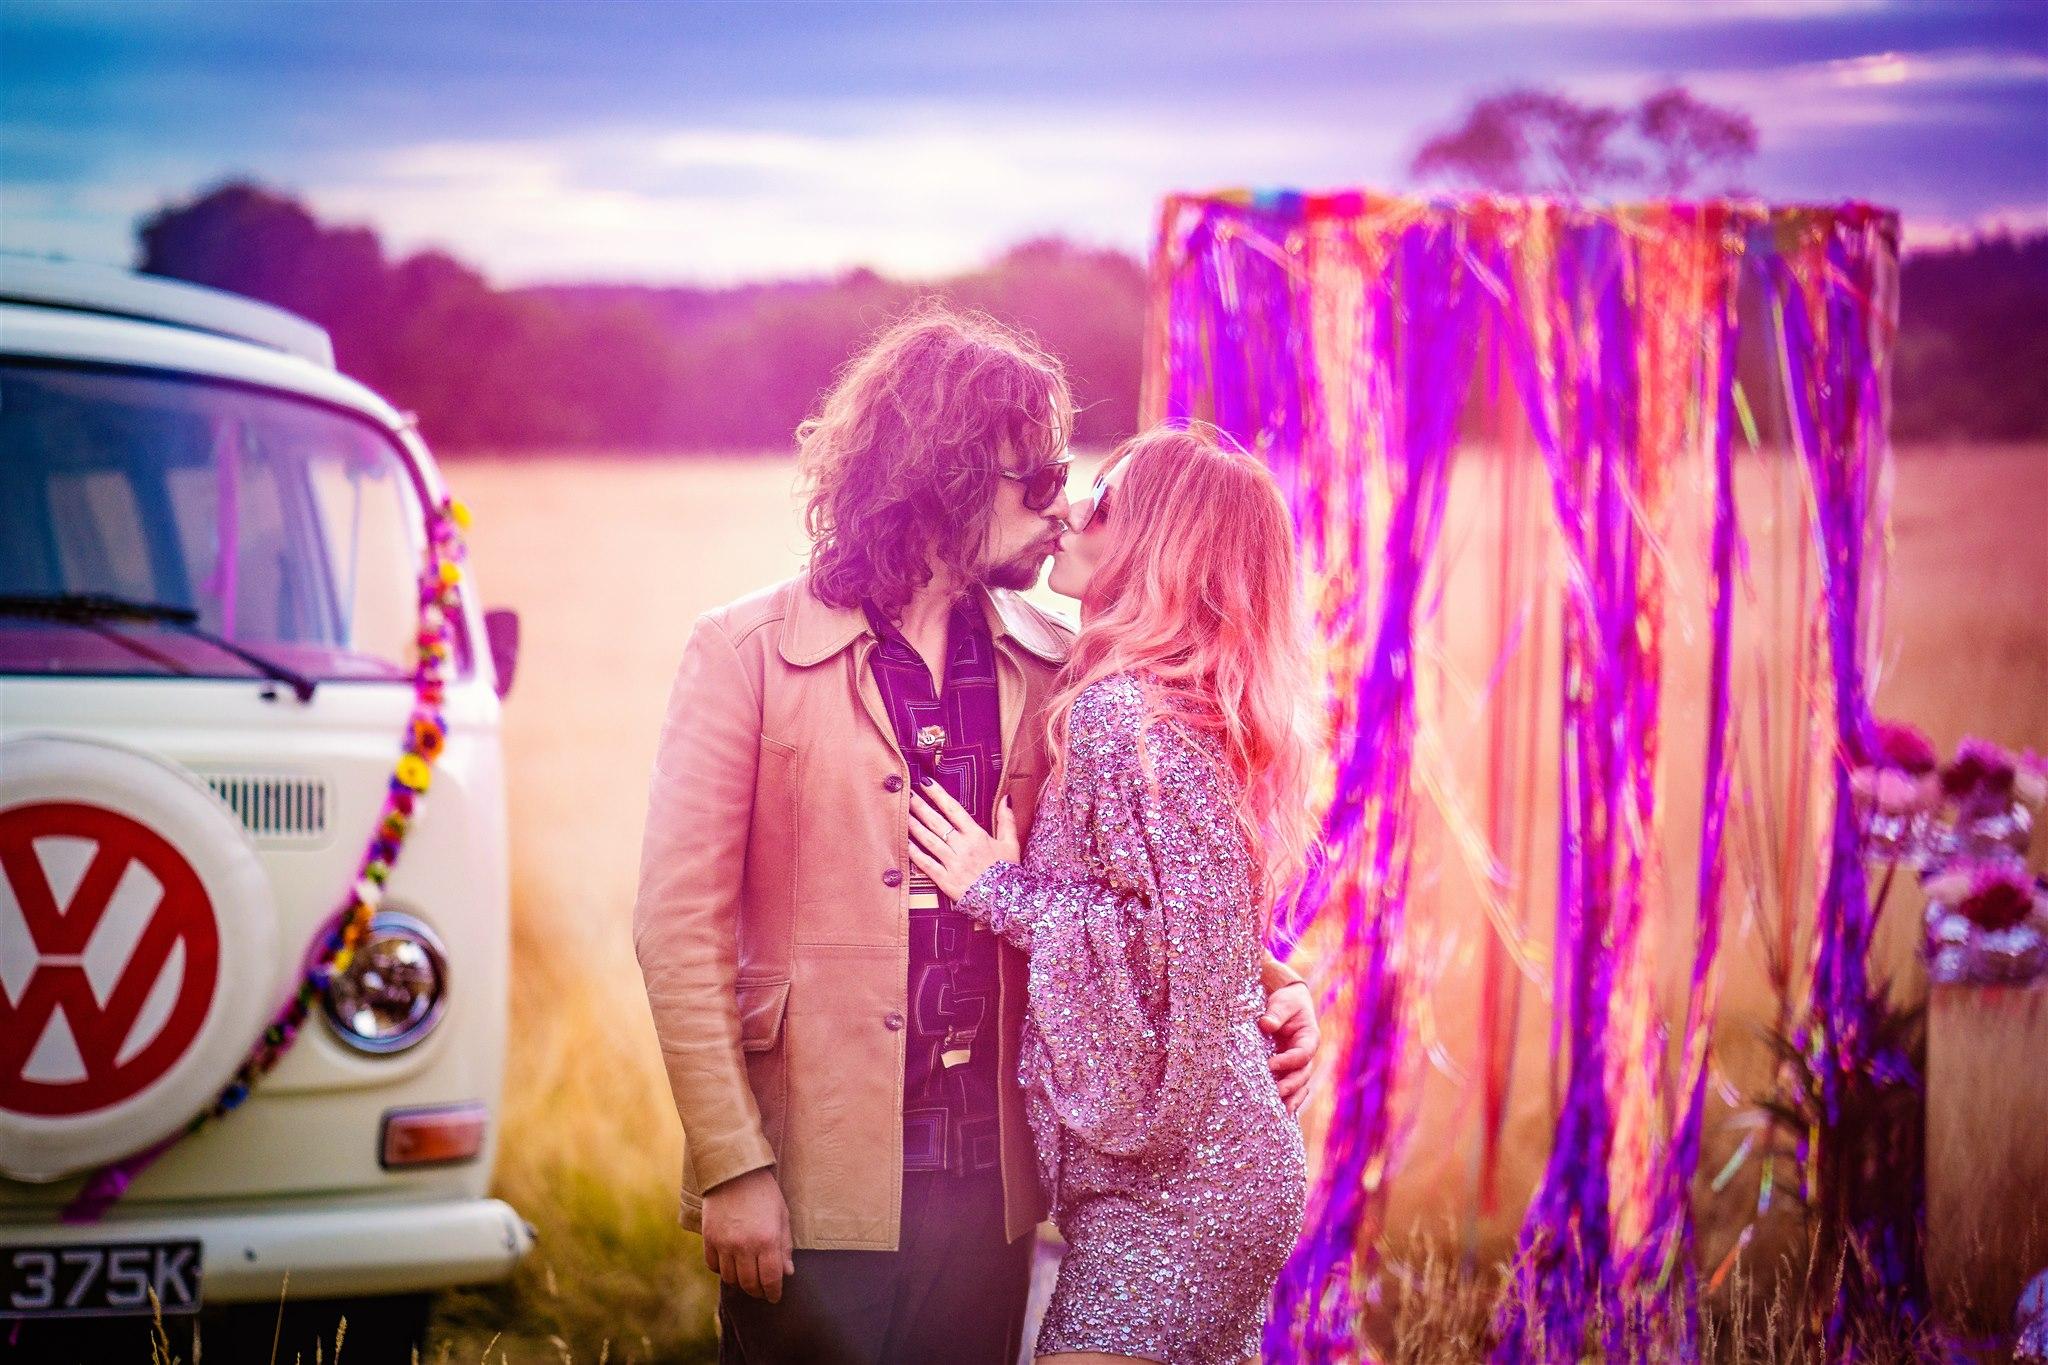 bohemian elopement - colourful bohemian wedding - 70s wedding - campervan wedding - hippie wedding - 70s wedding style